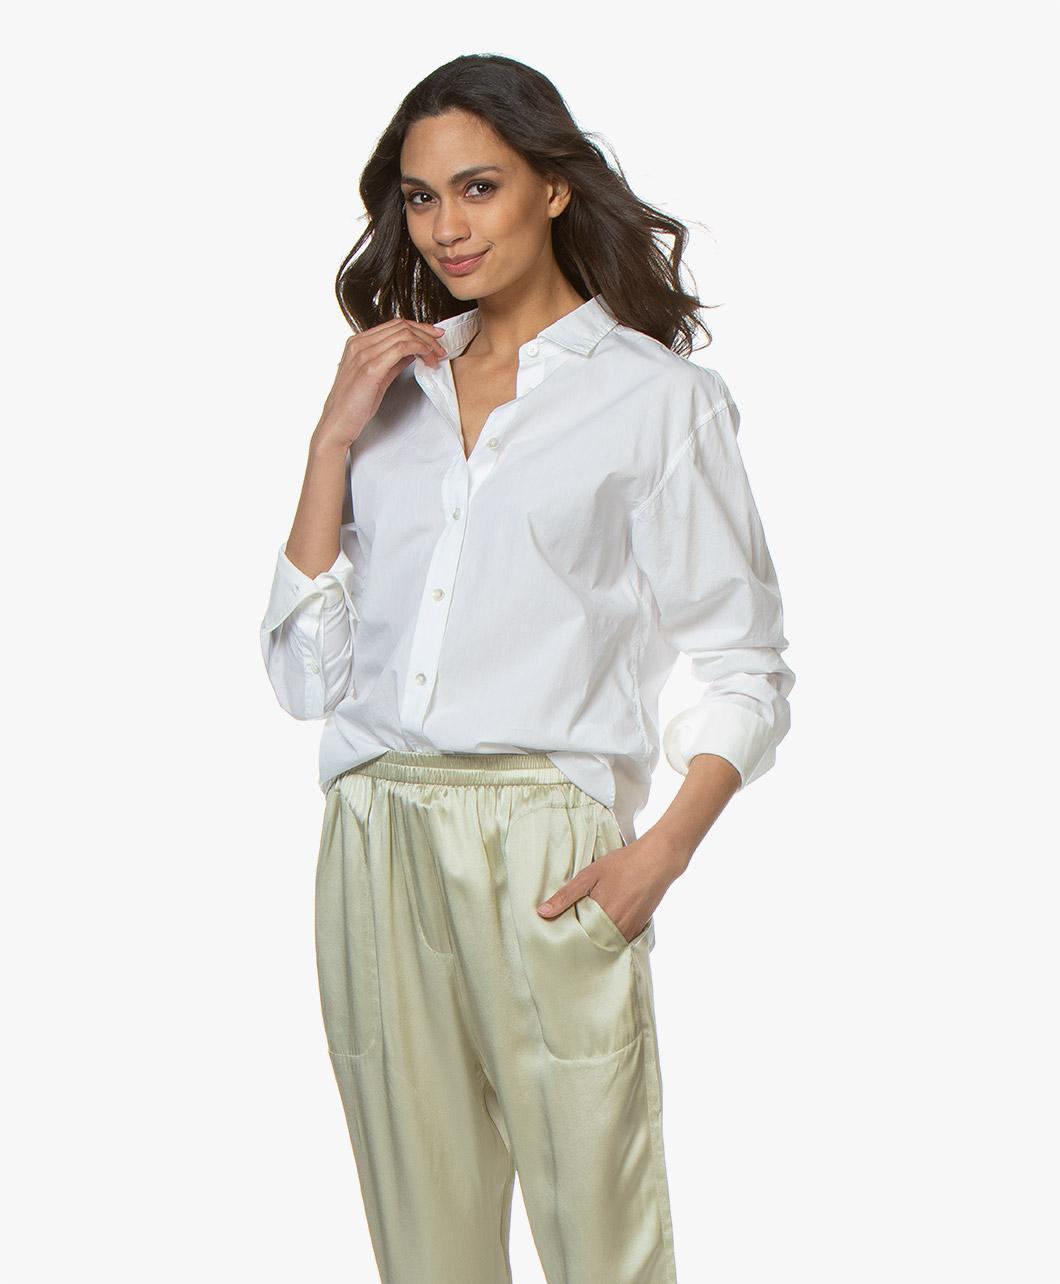 Afbeelding van Closed Blouse Lilo Katoenen Poplin Overhemd in Wit